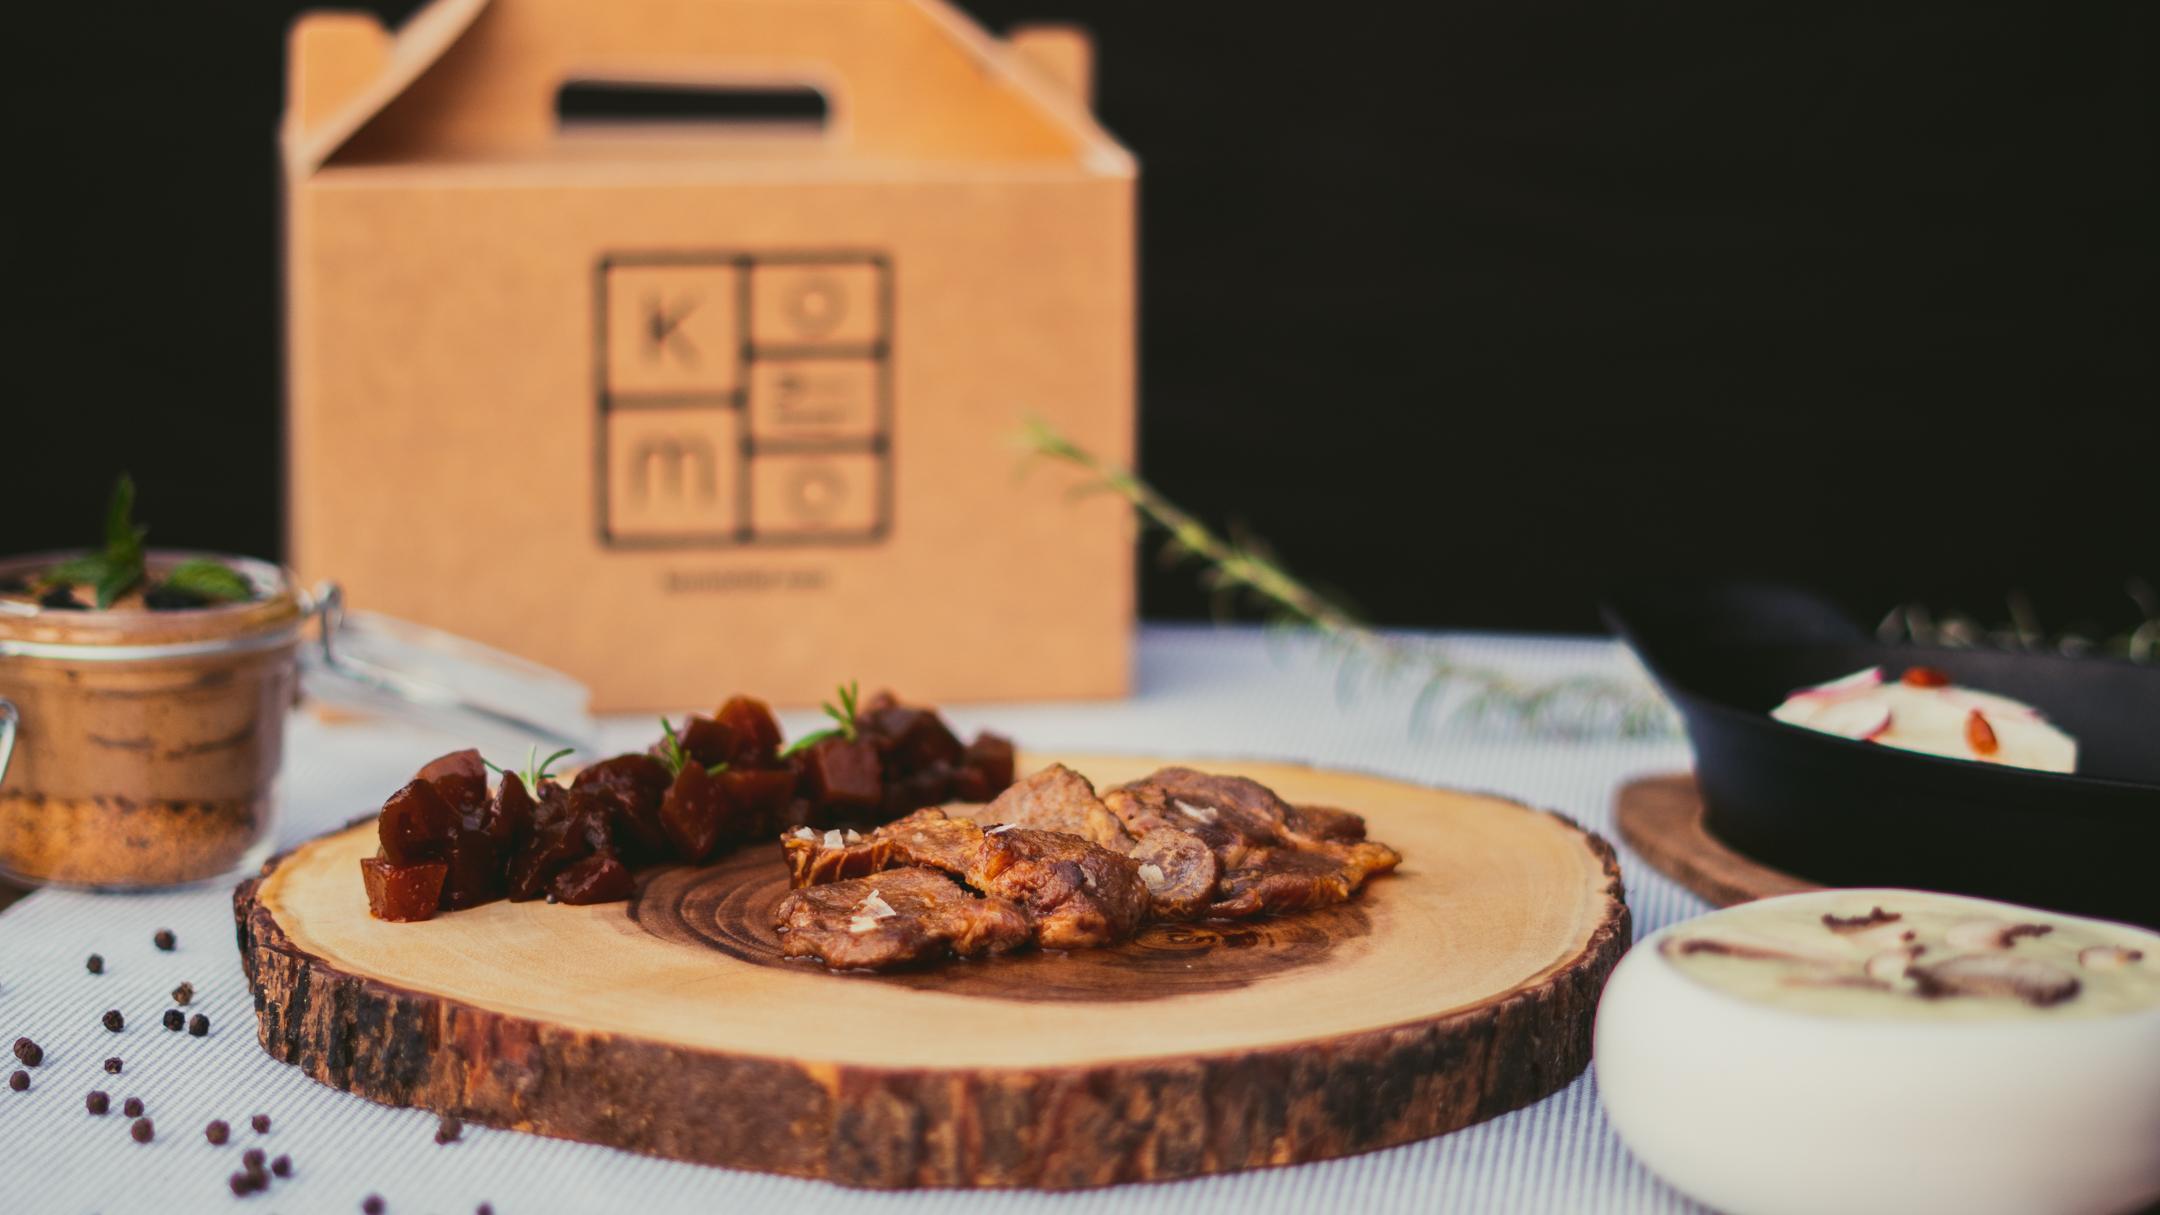 Menú Komoledo - Komo, cocina gourmet en tu casa